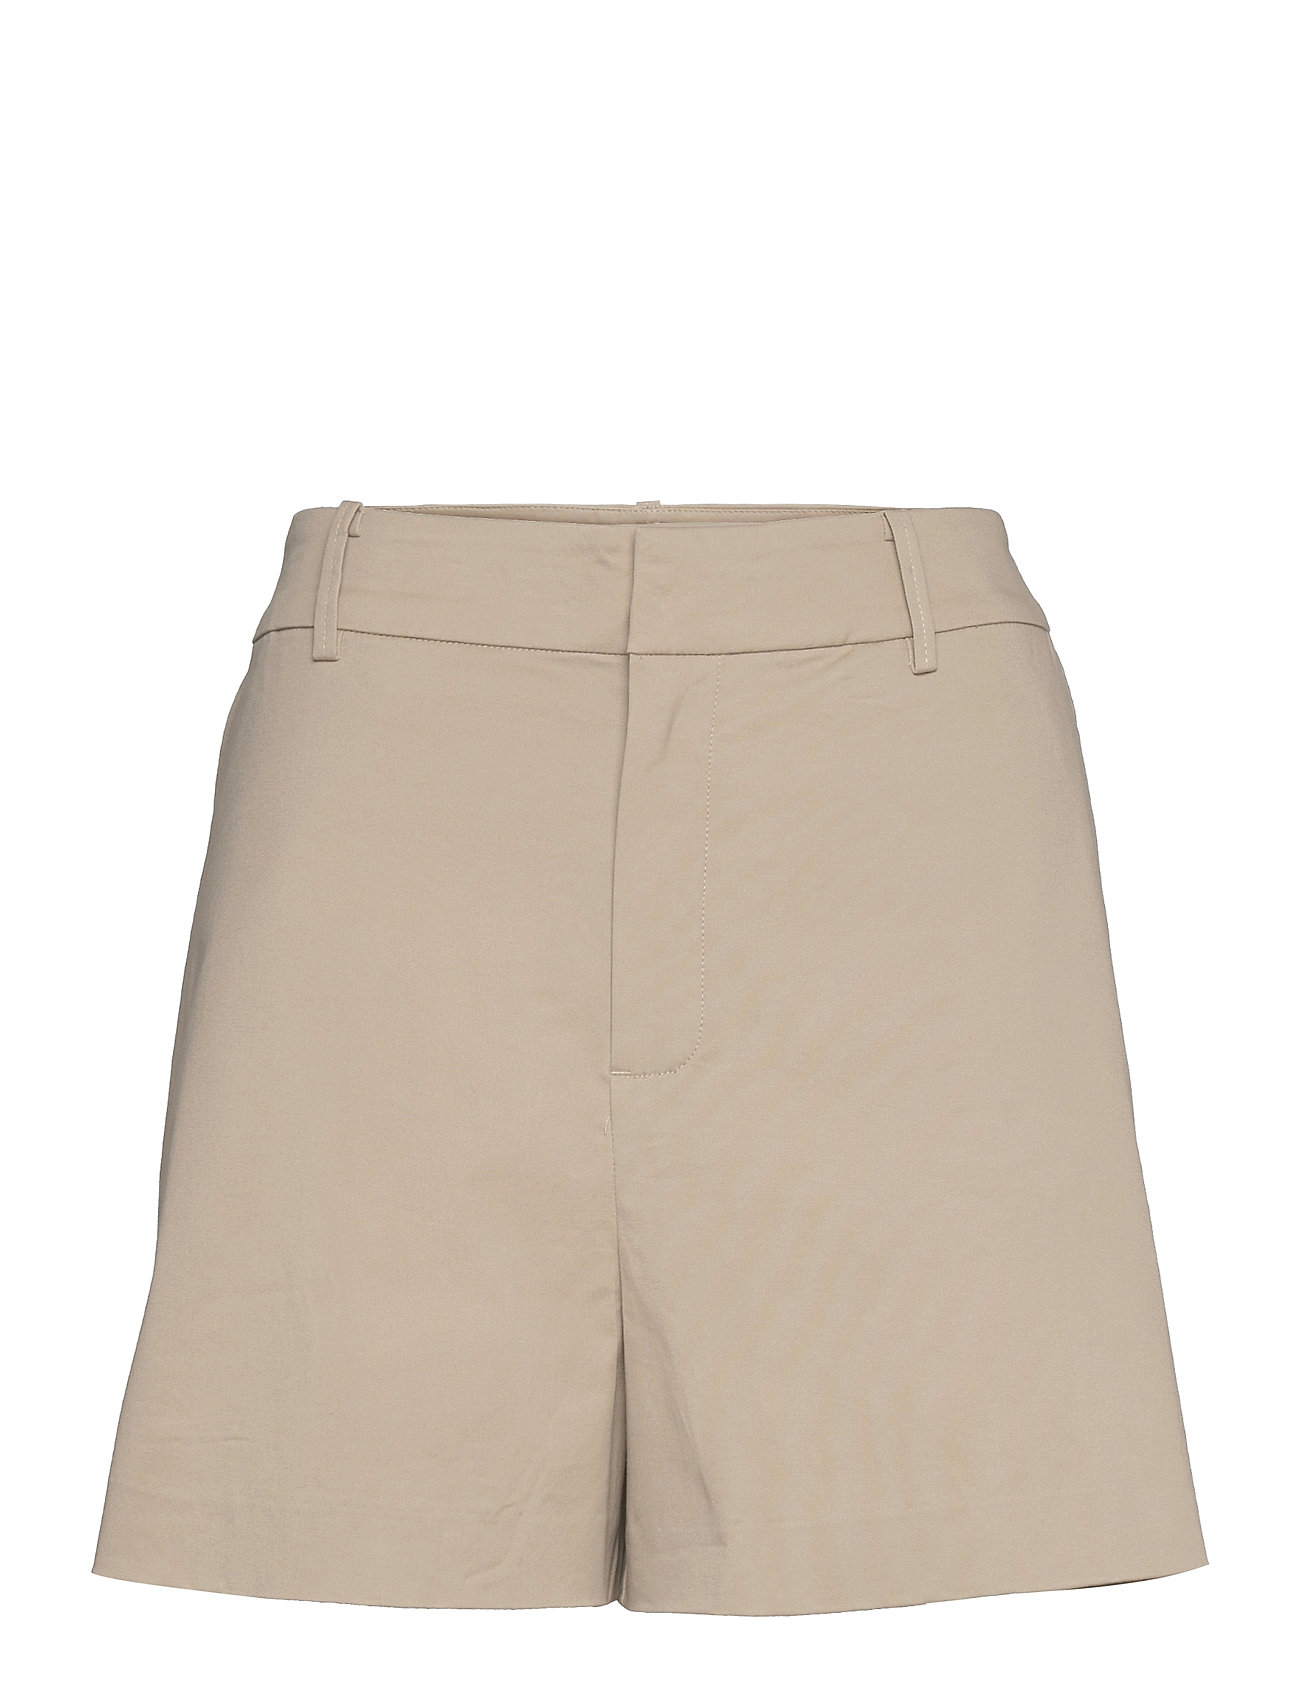 Image of Chino Shorts Chino Shorts Beige Mango (3533486263)